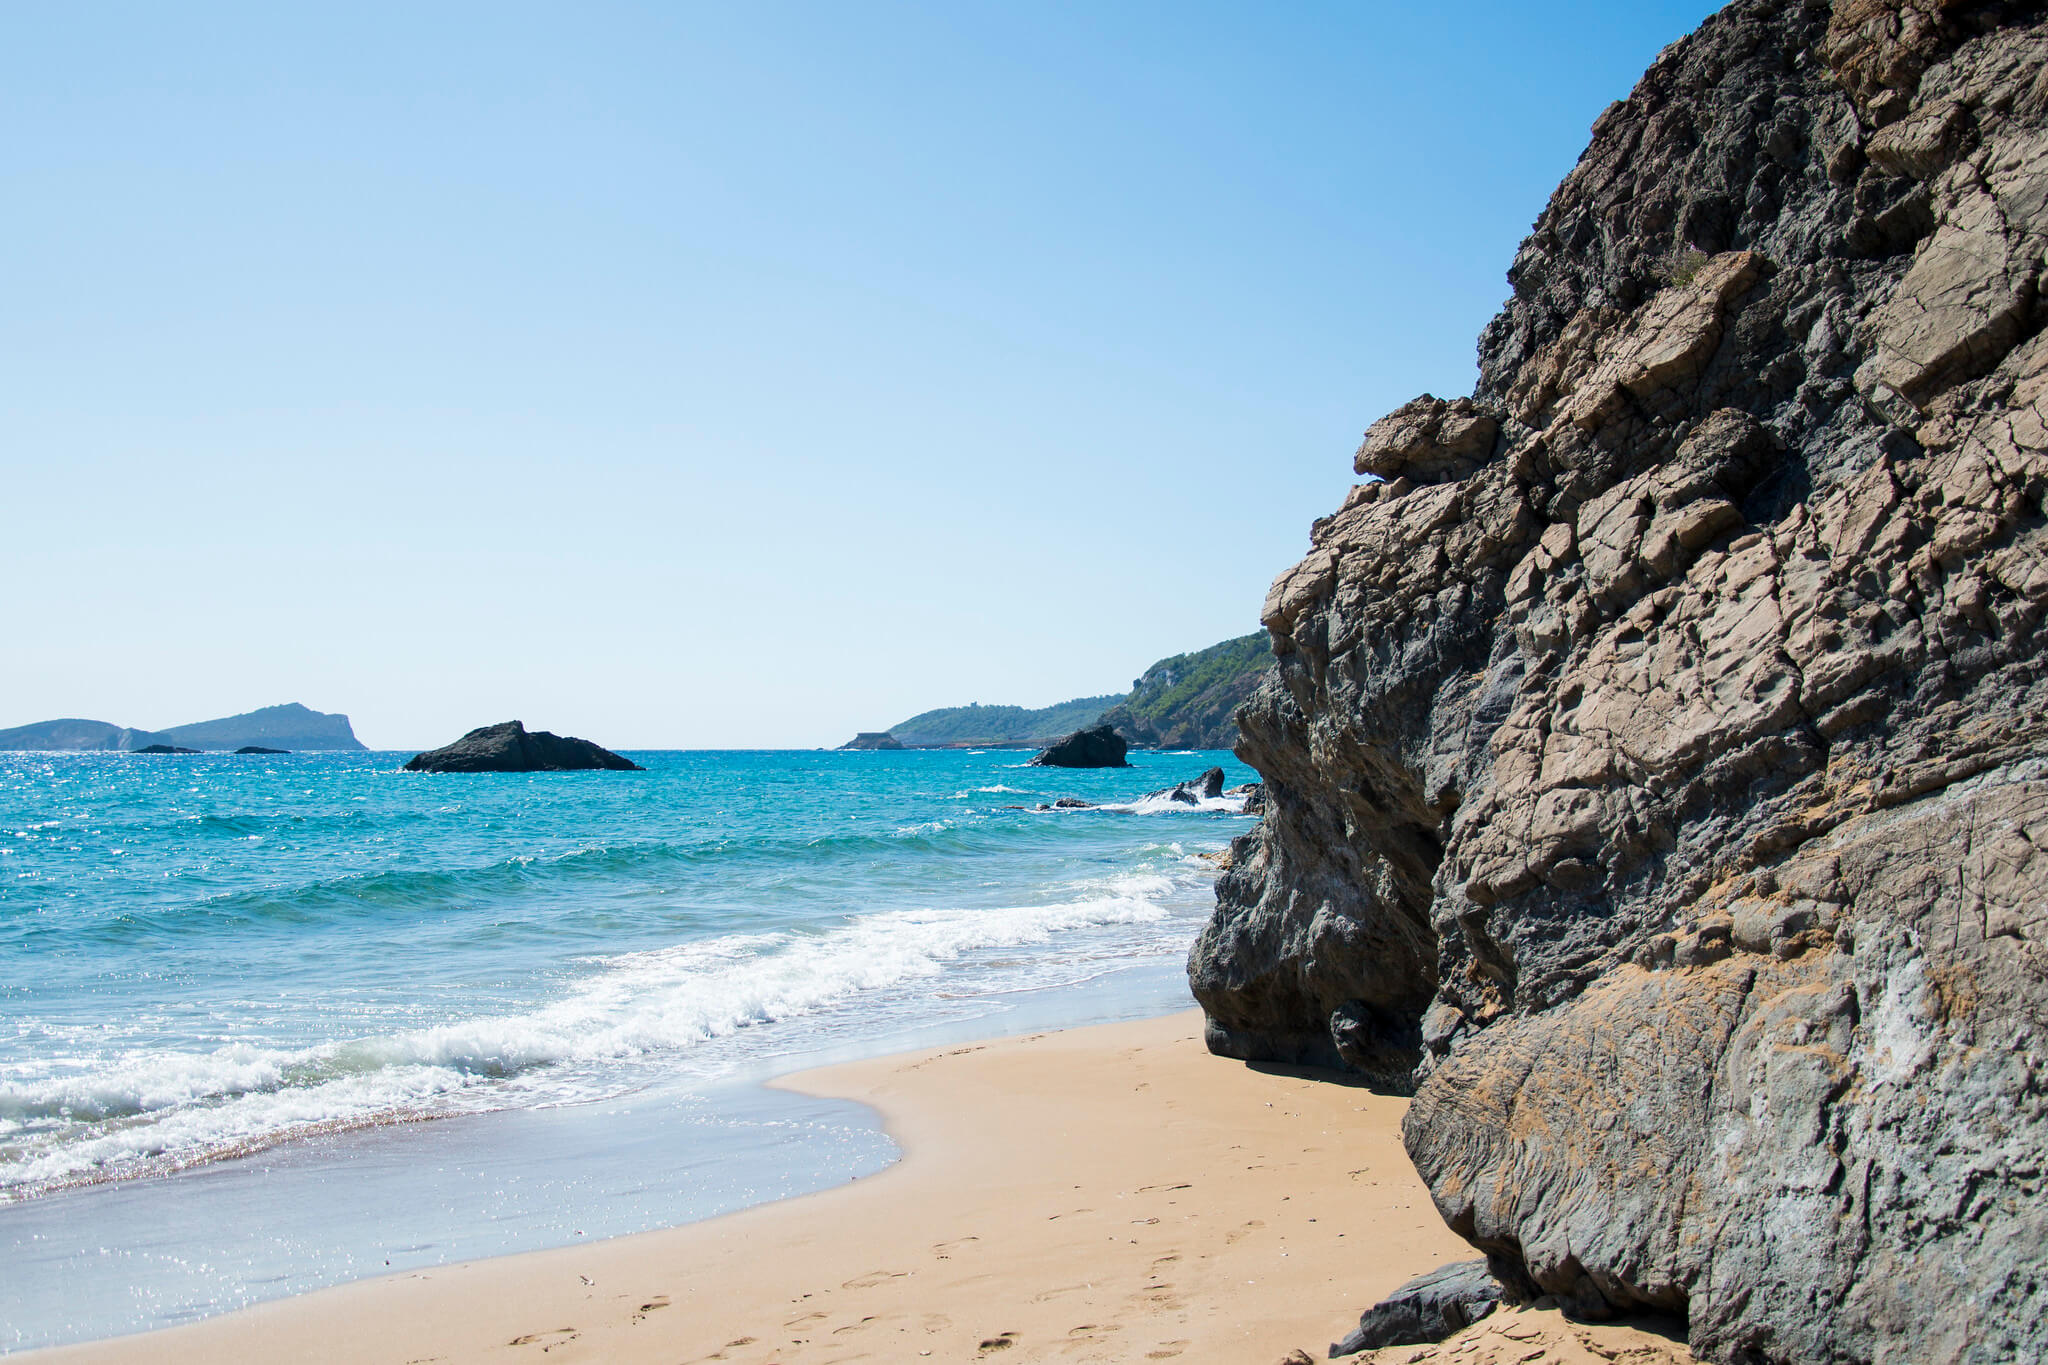 https://www.white-ibiza.com/wp-content/uploads/2020/03/ibiza-beaches-aguas-blancas-05.jpg